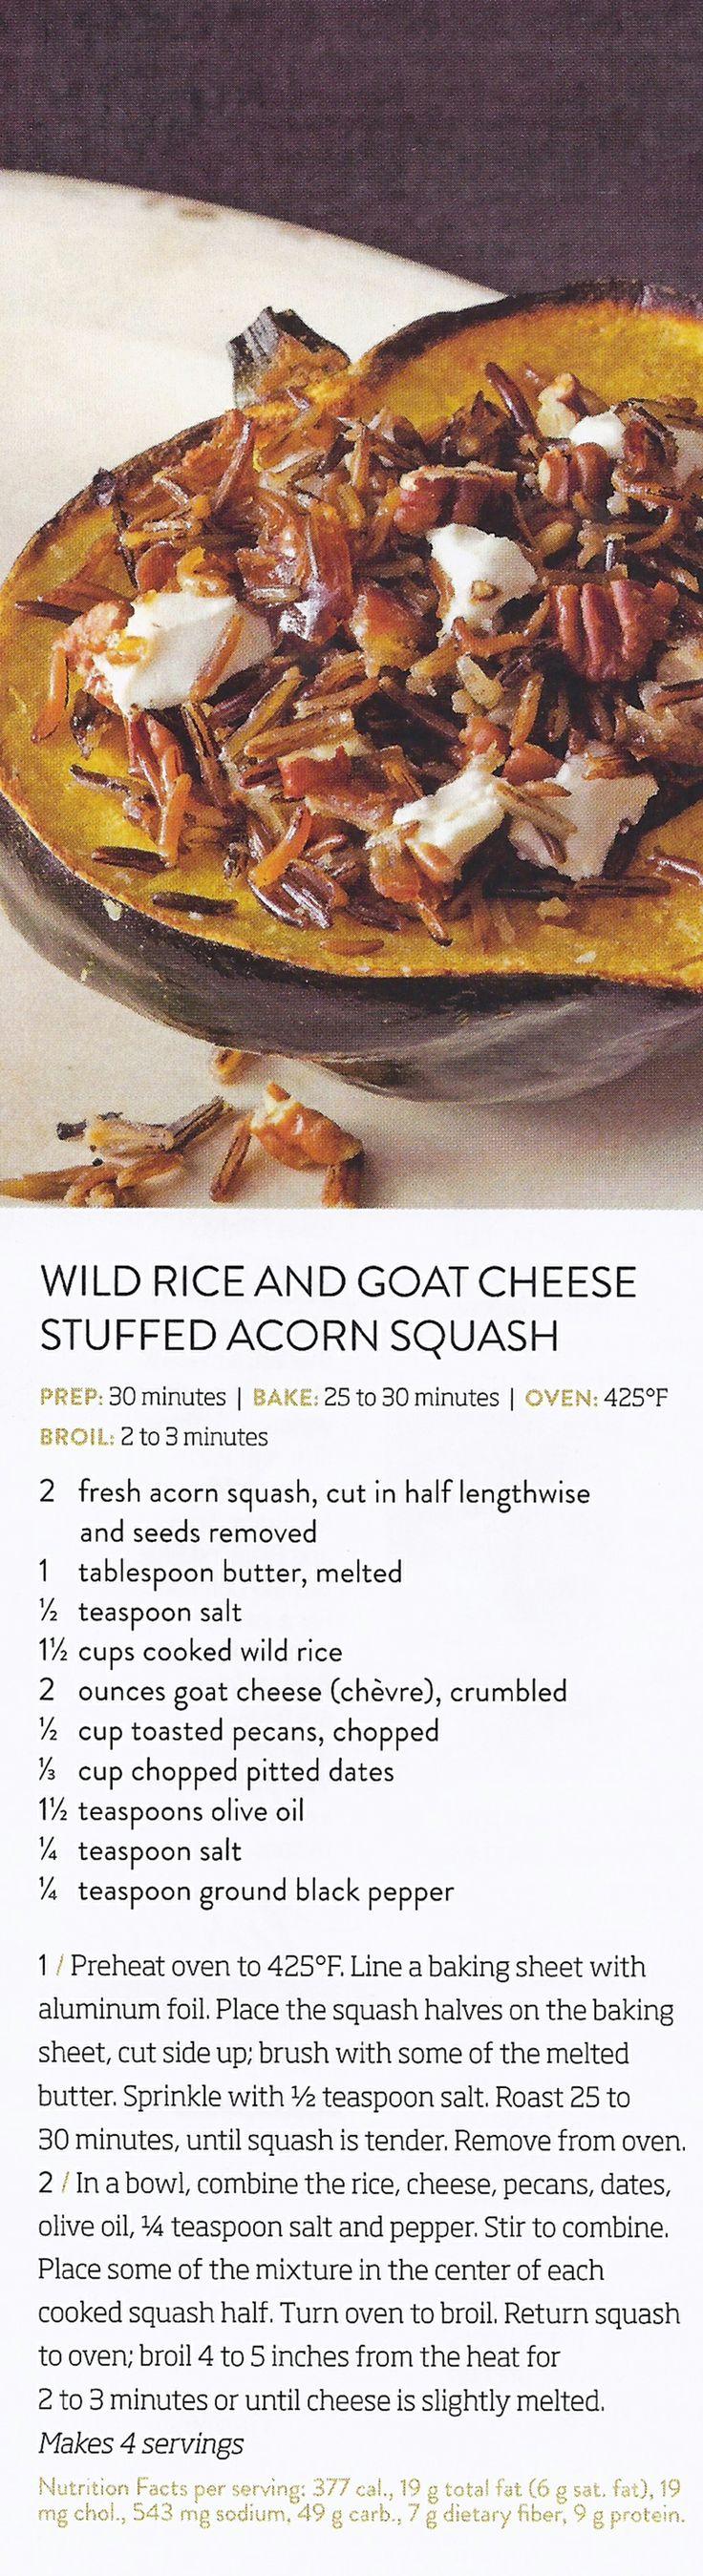 Wild Rice and Goat Cheese Stuffed Acorn Squash